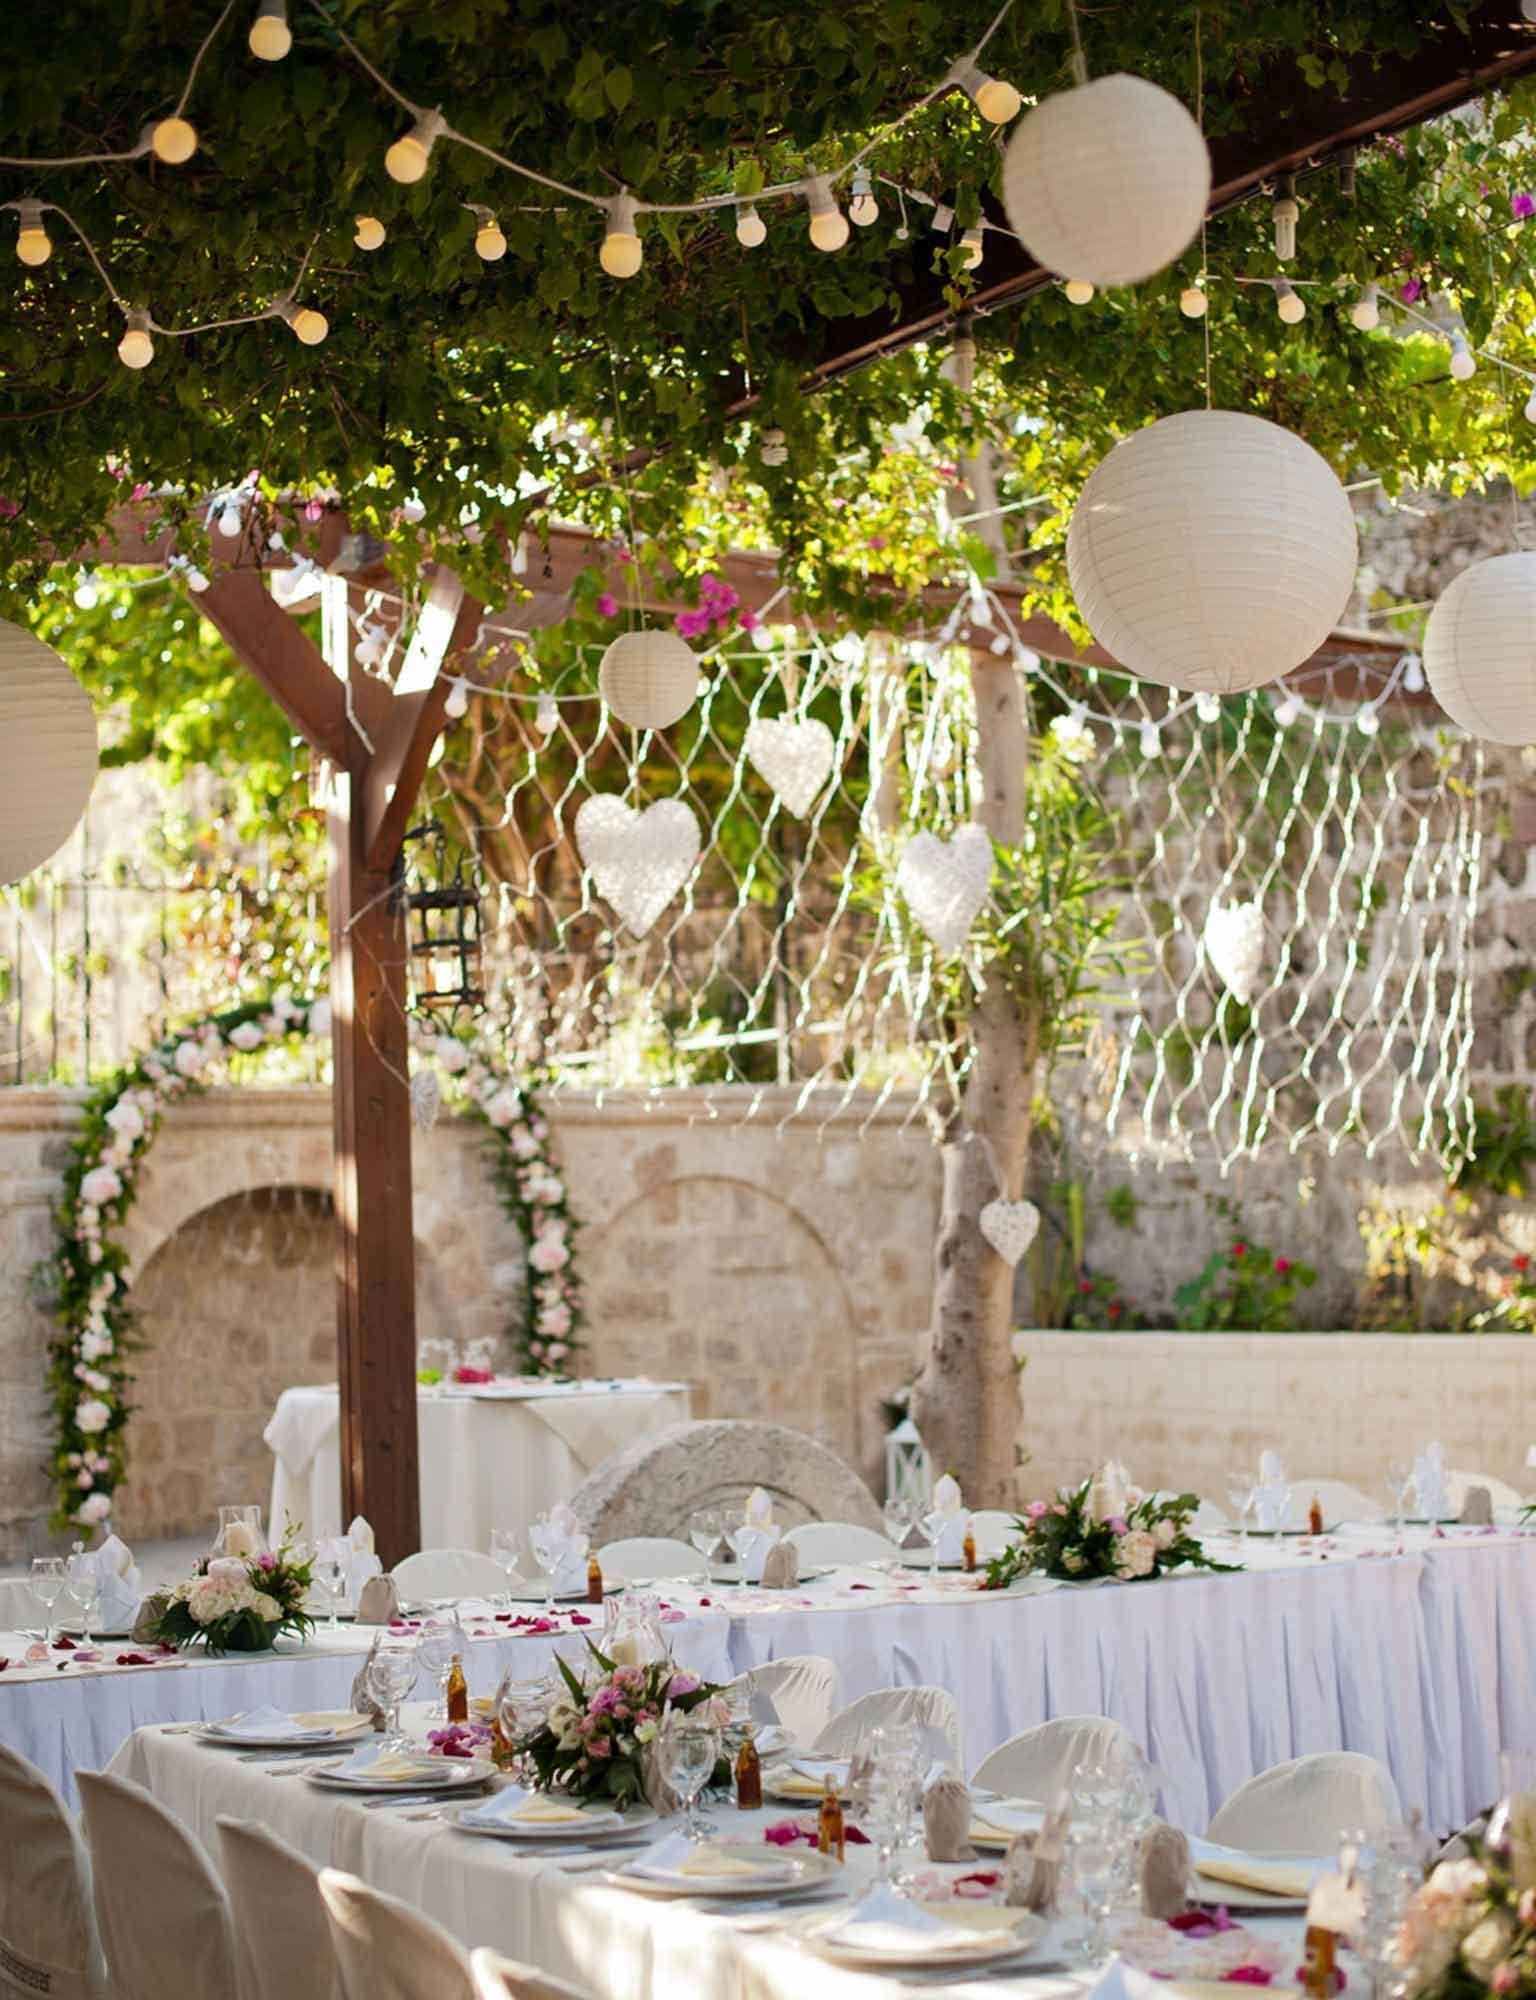 Alfresco Wedding Light Ideas | Wedding Light Ideas | Inspiration Regarding Outdoor Lanterns For Wedding (View 2 of 20)